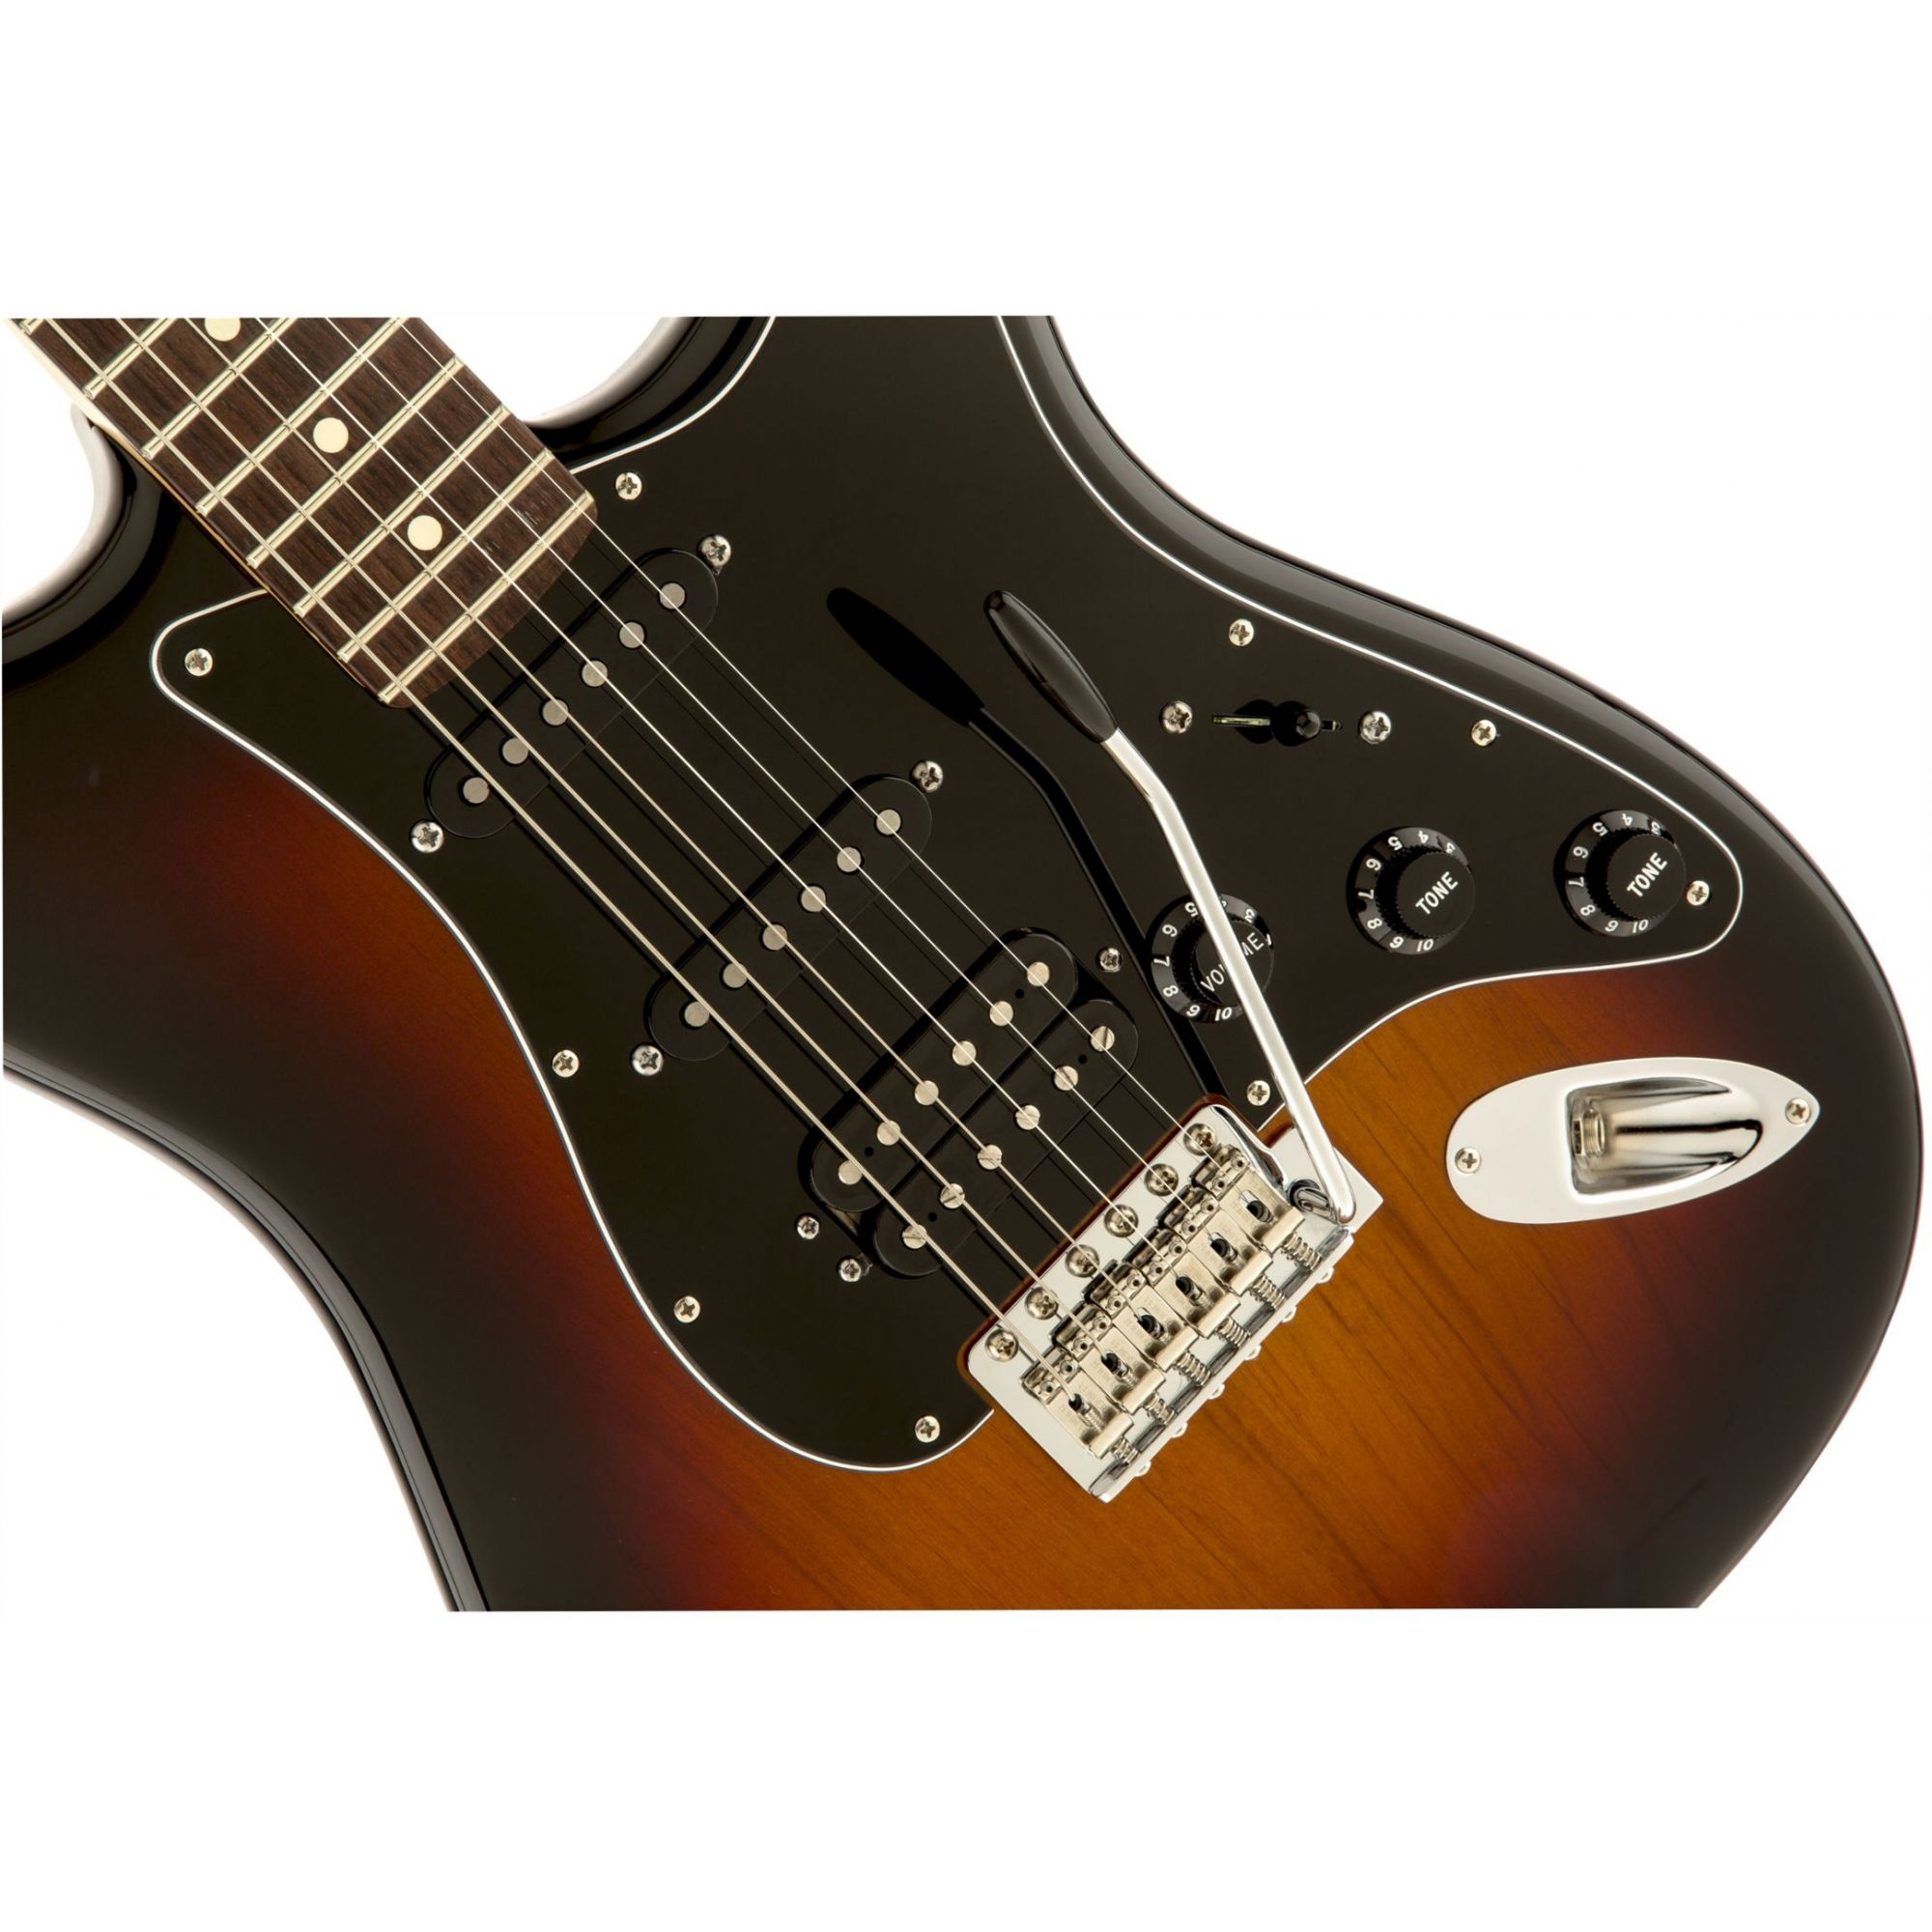 Guitarra Fender USA Special Stratocaster HSS-300 Sumburst 3-color